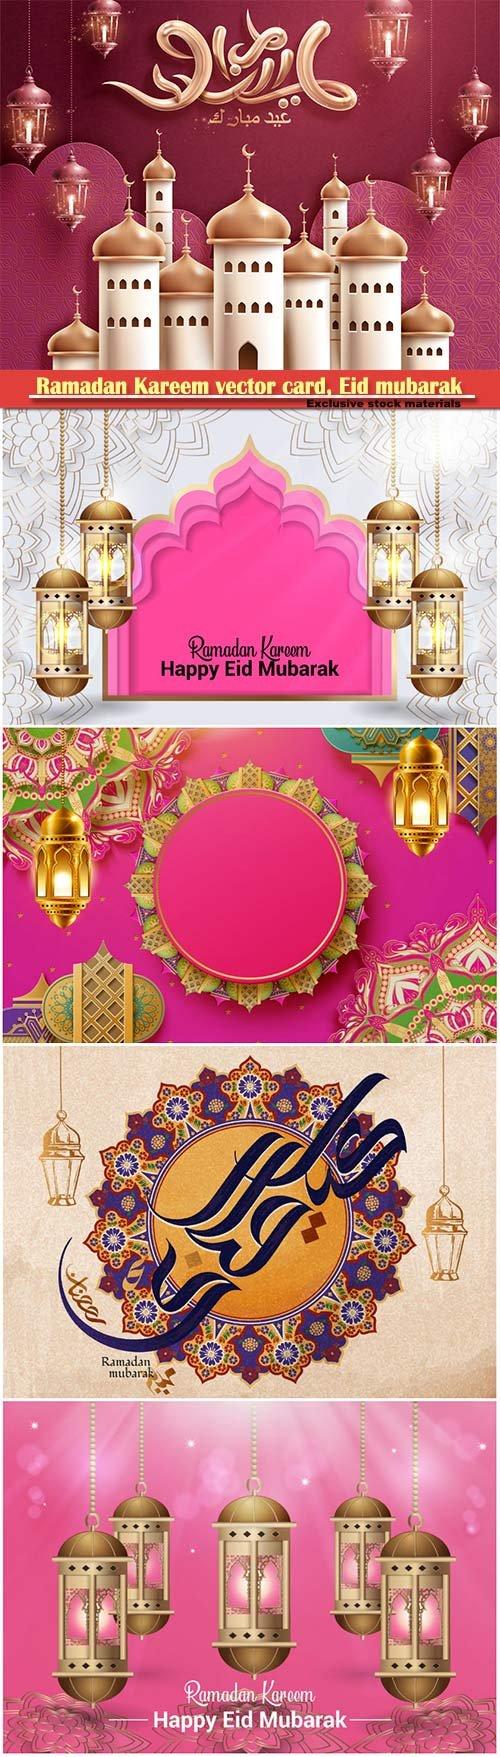 Ramadan Kareem vector card, Eid mubarak calligraphy design templates # 29